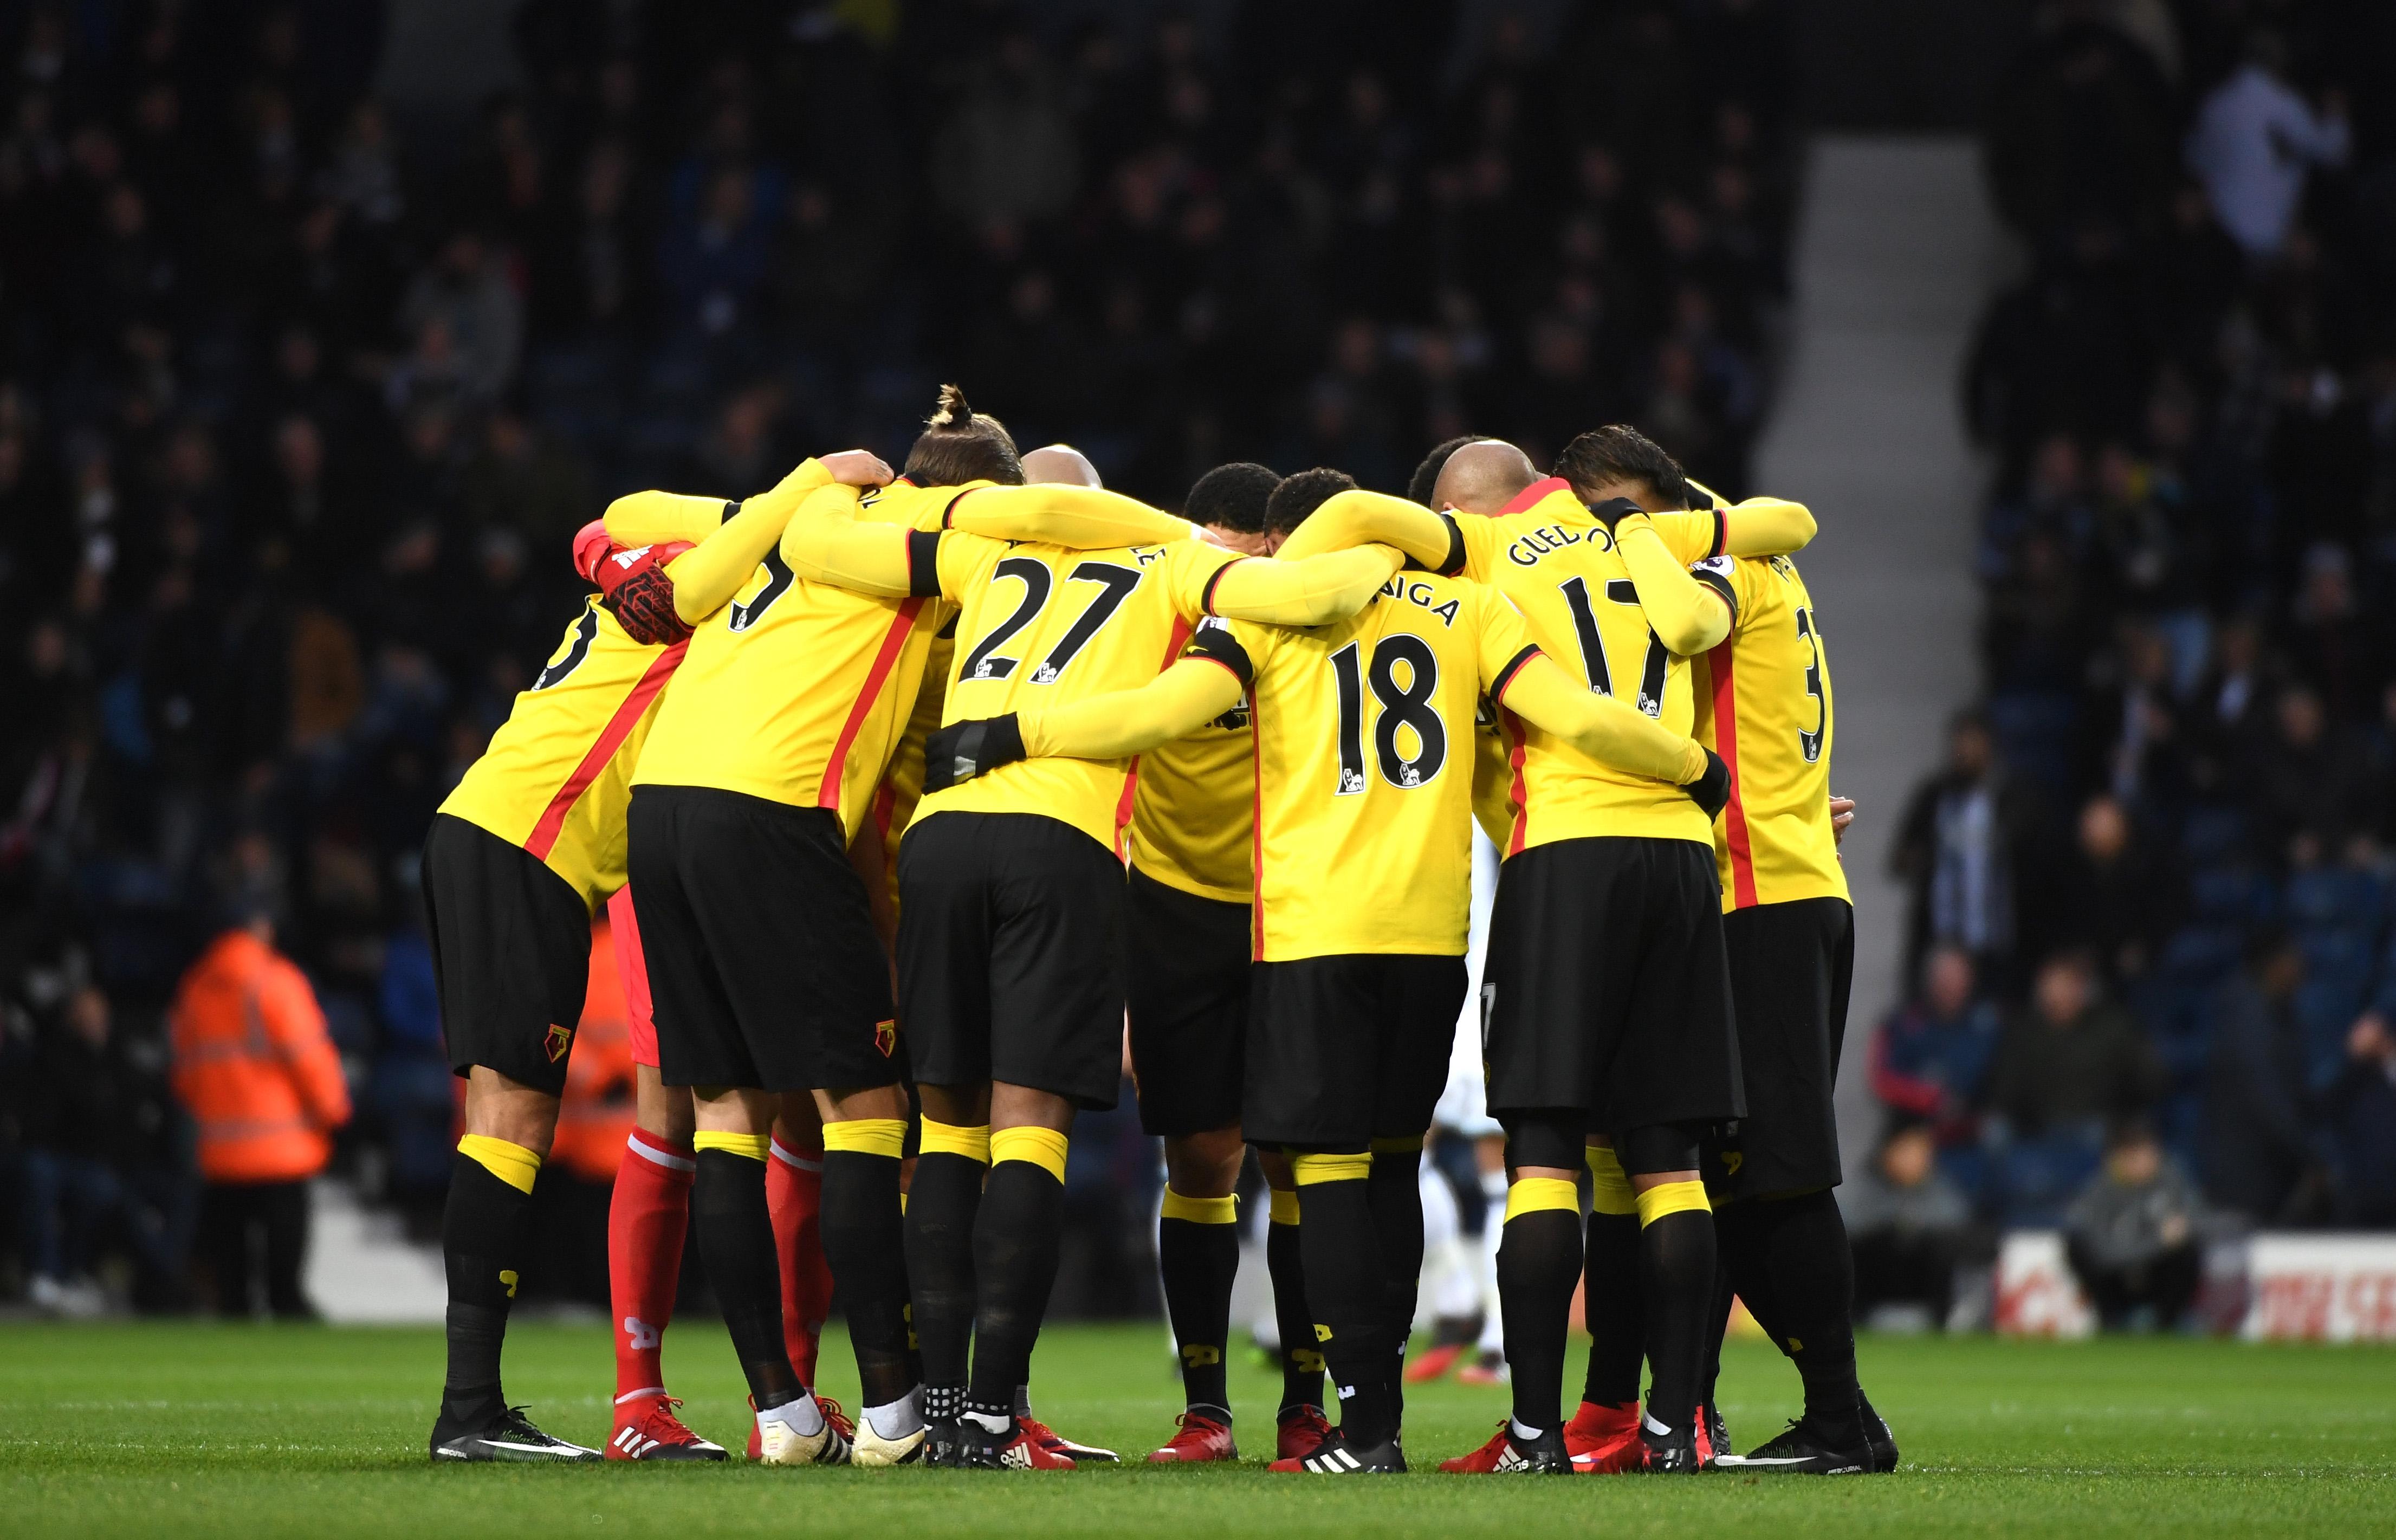 Watford 3 Everton 2: Stefano Okaka double sinks Toffees